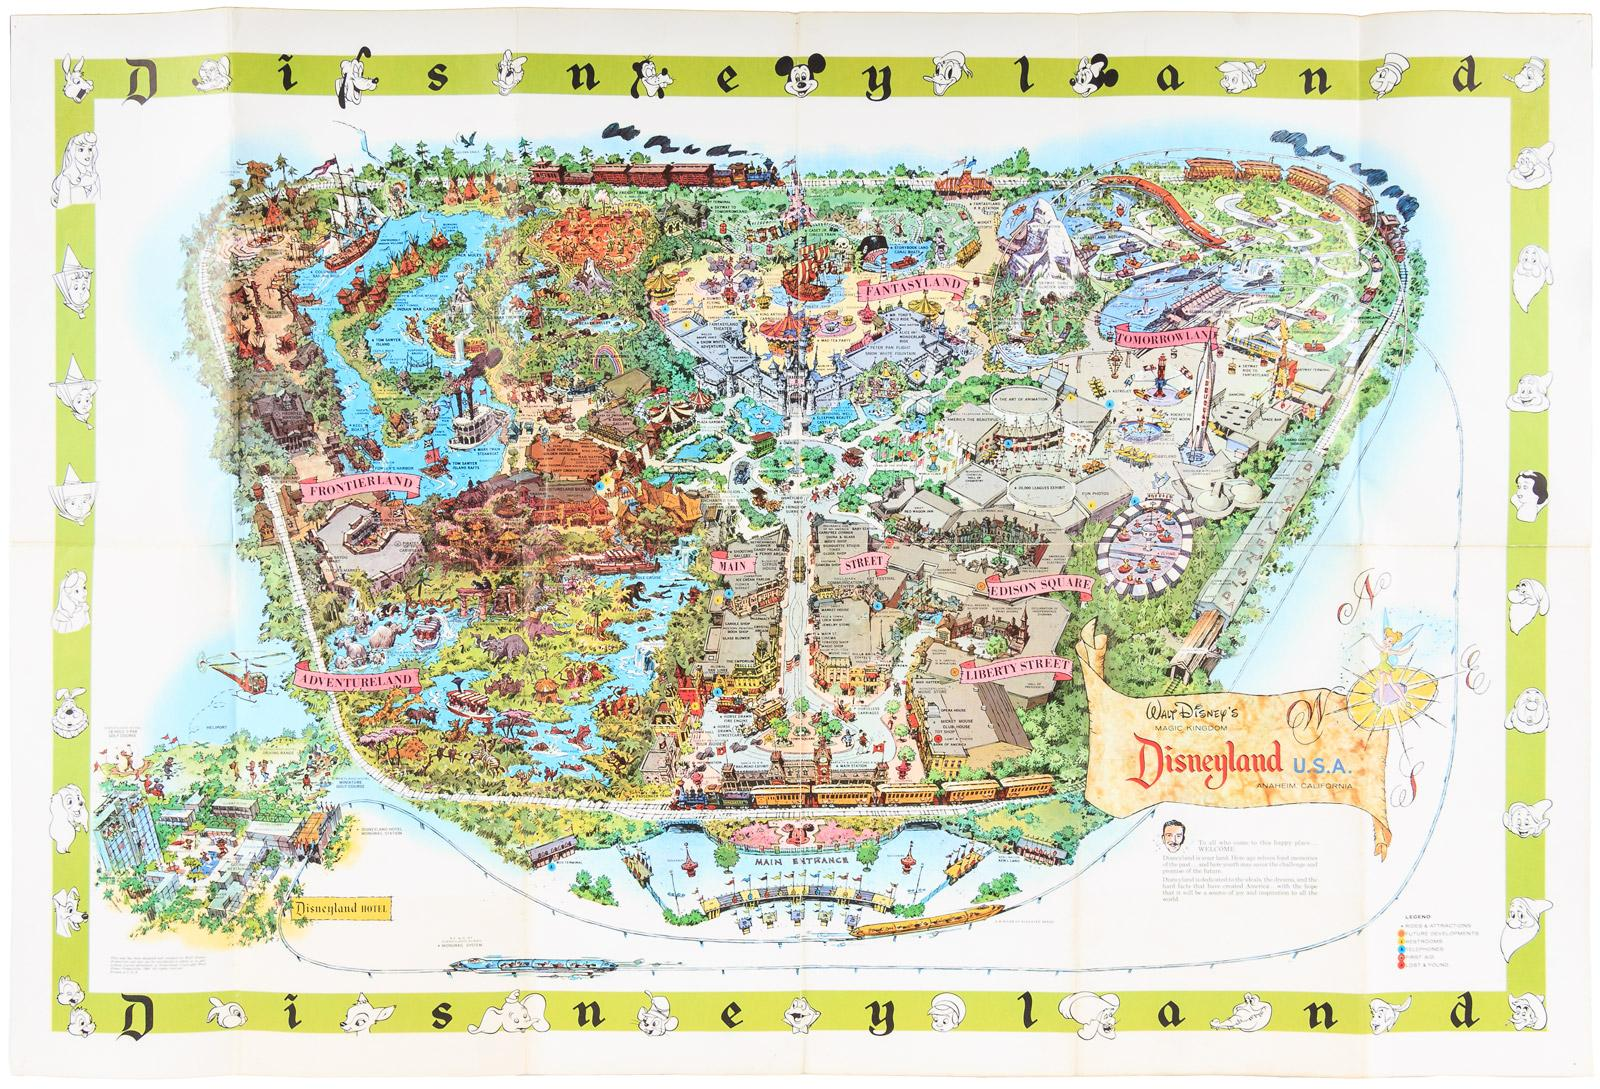 Disneyland Usa Map.Walt Disney S Magic Kingdom Disneyland U S A 1964 Full Color Map